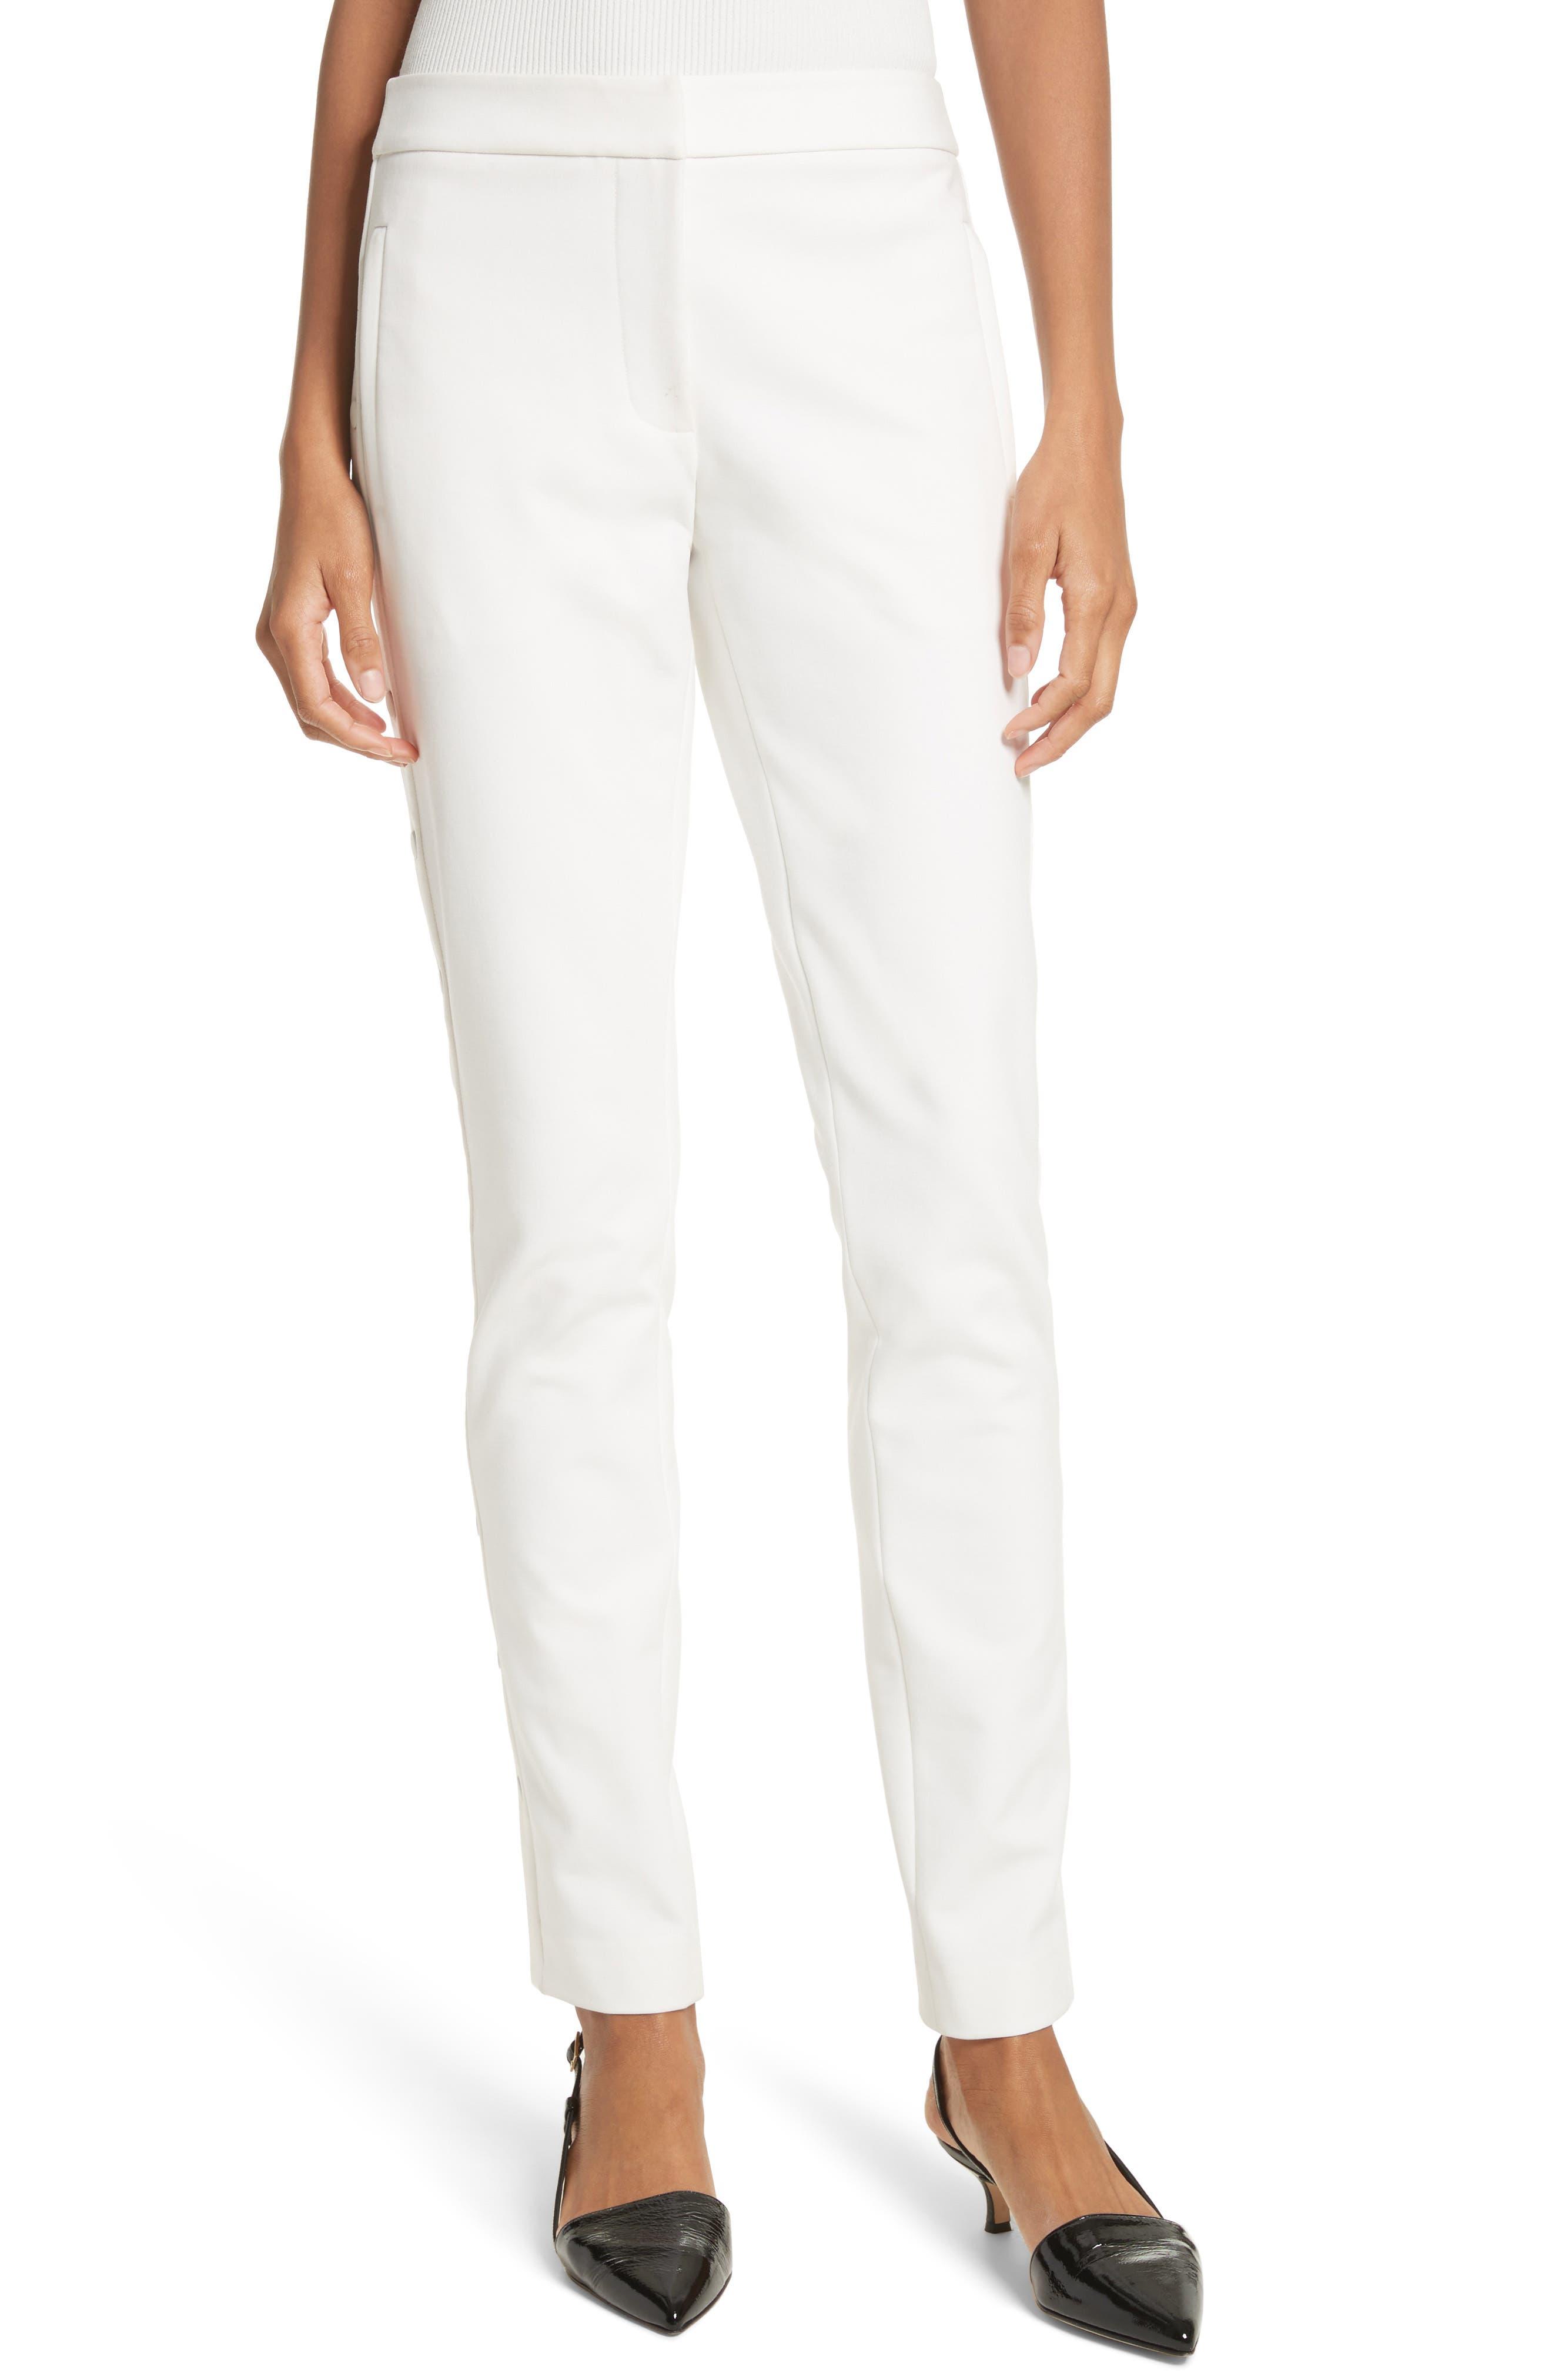 Anson Snap Side Skinny Pants,                             Main thumbnail 1, color,                             Ivory